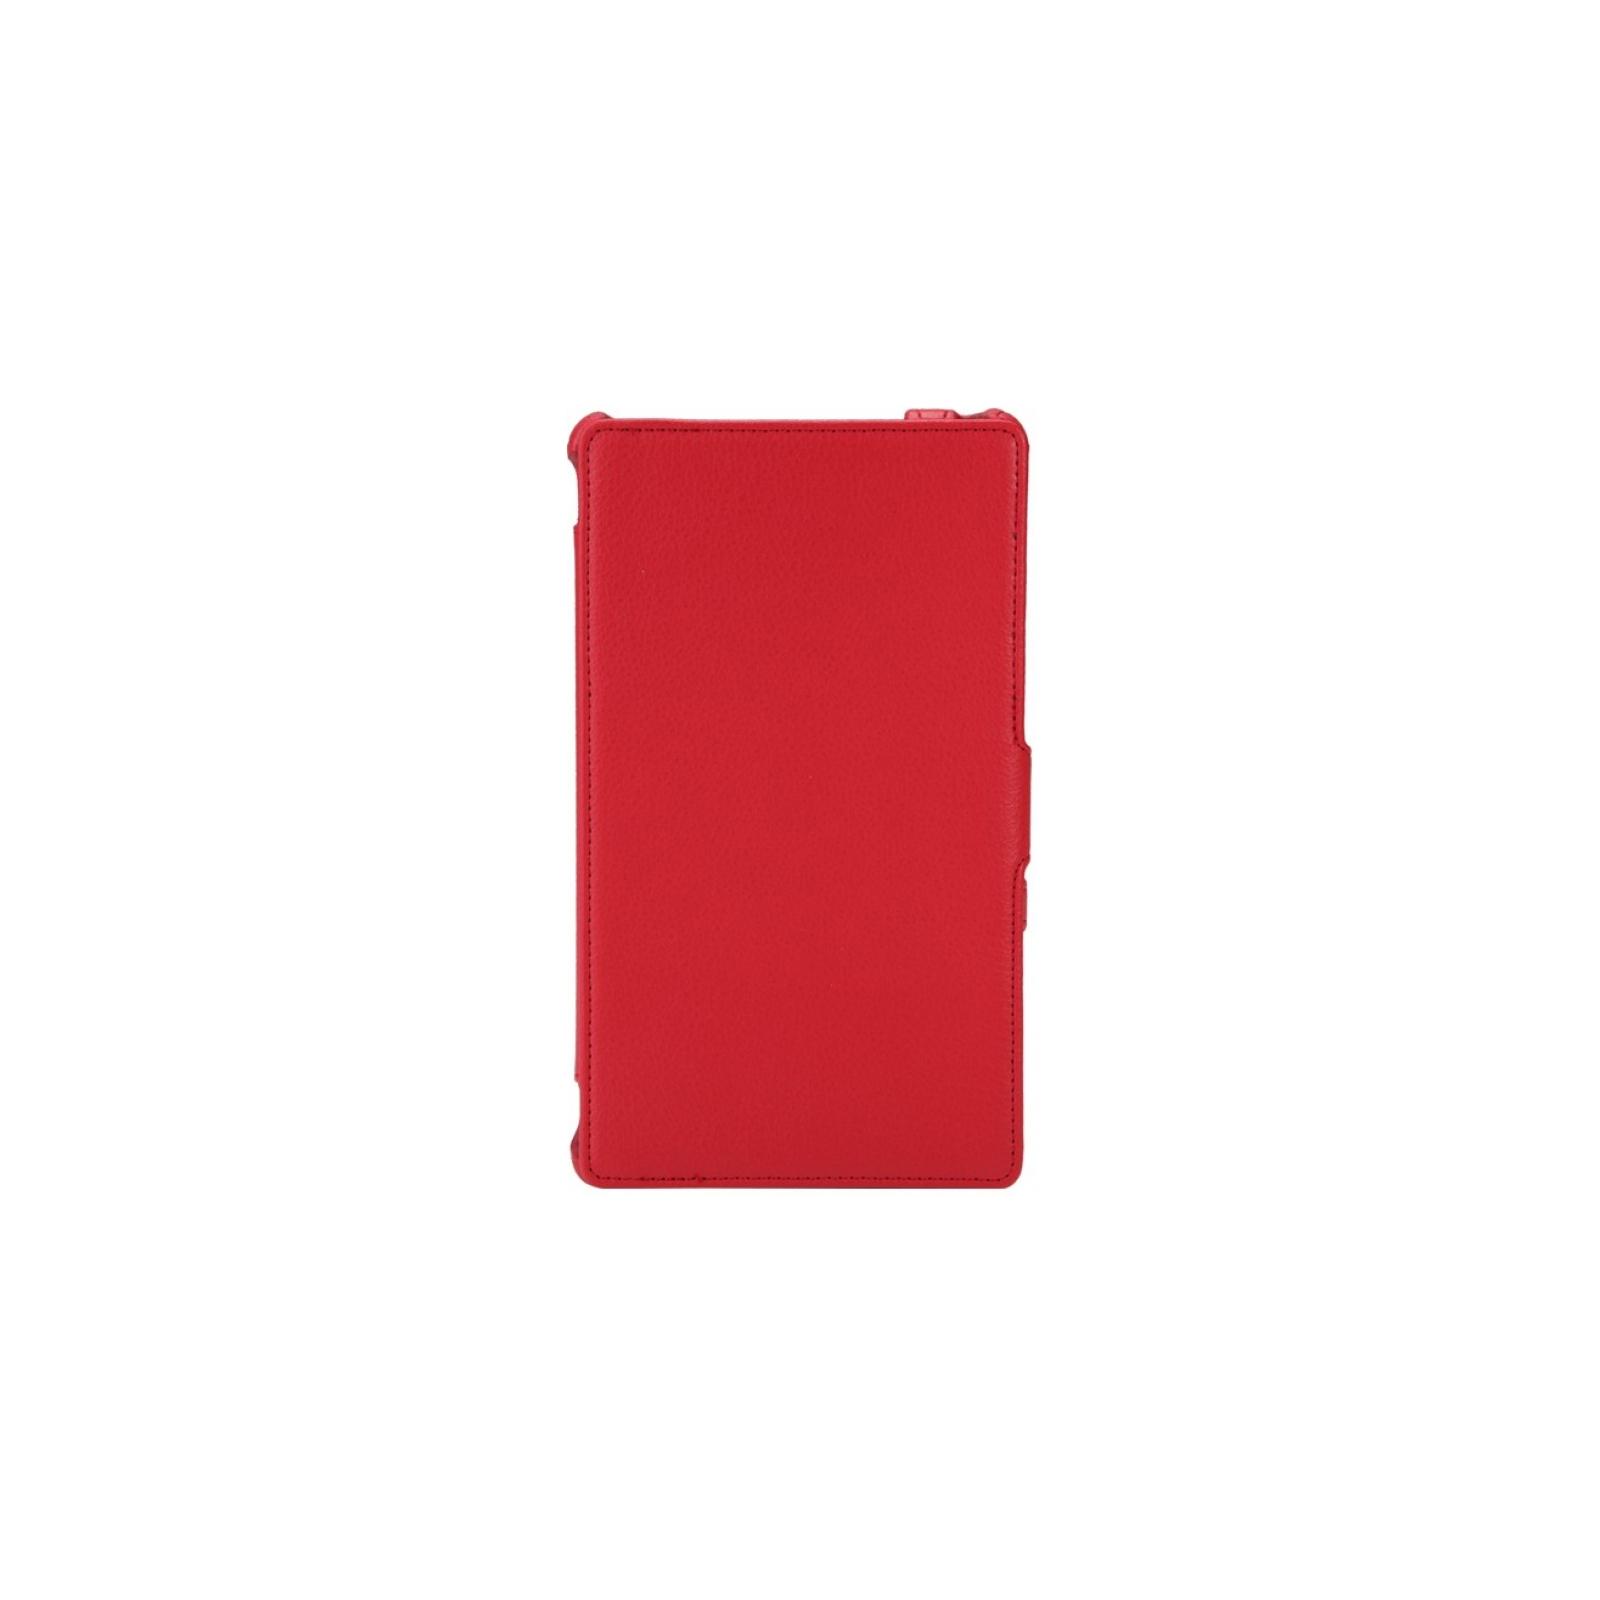 Чехол для планшета AirOn для ASUS ZenPad 7.0 (Z170) (4822352775551)